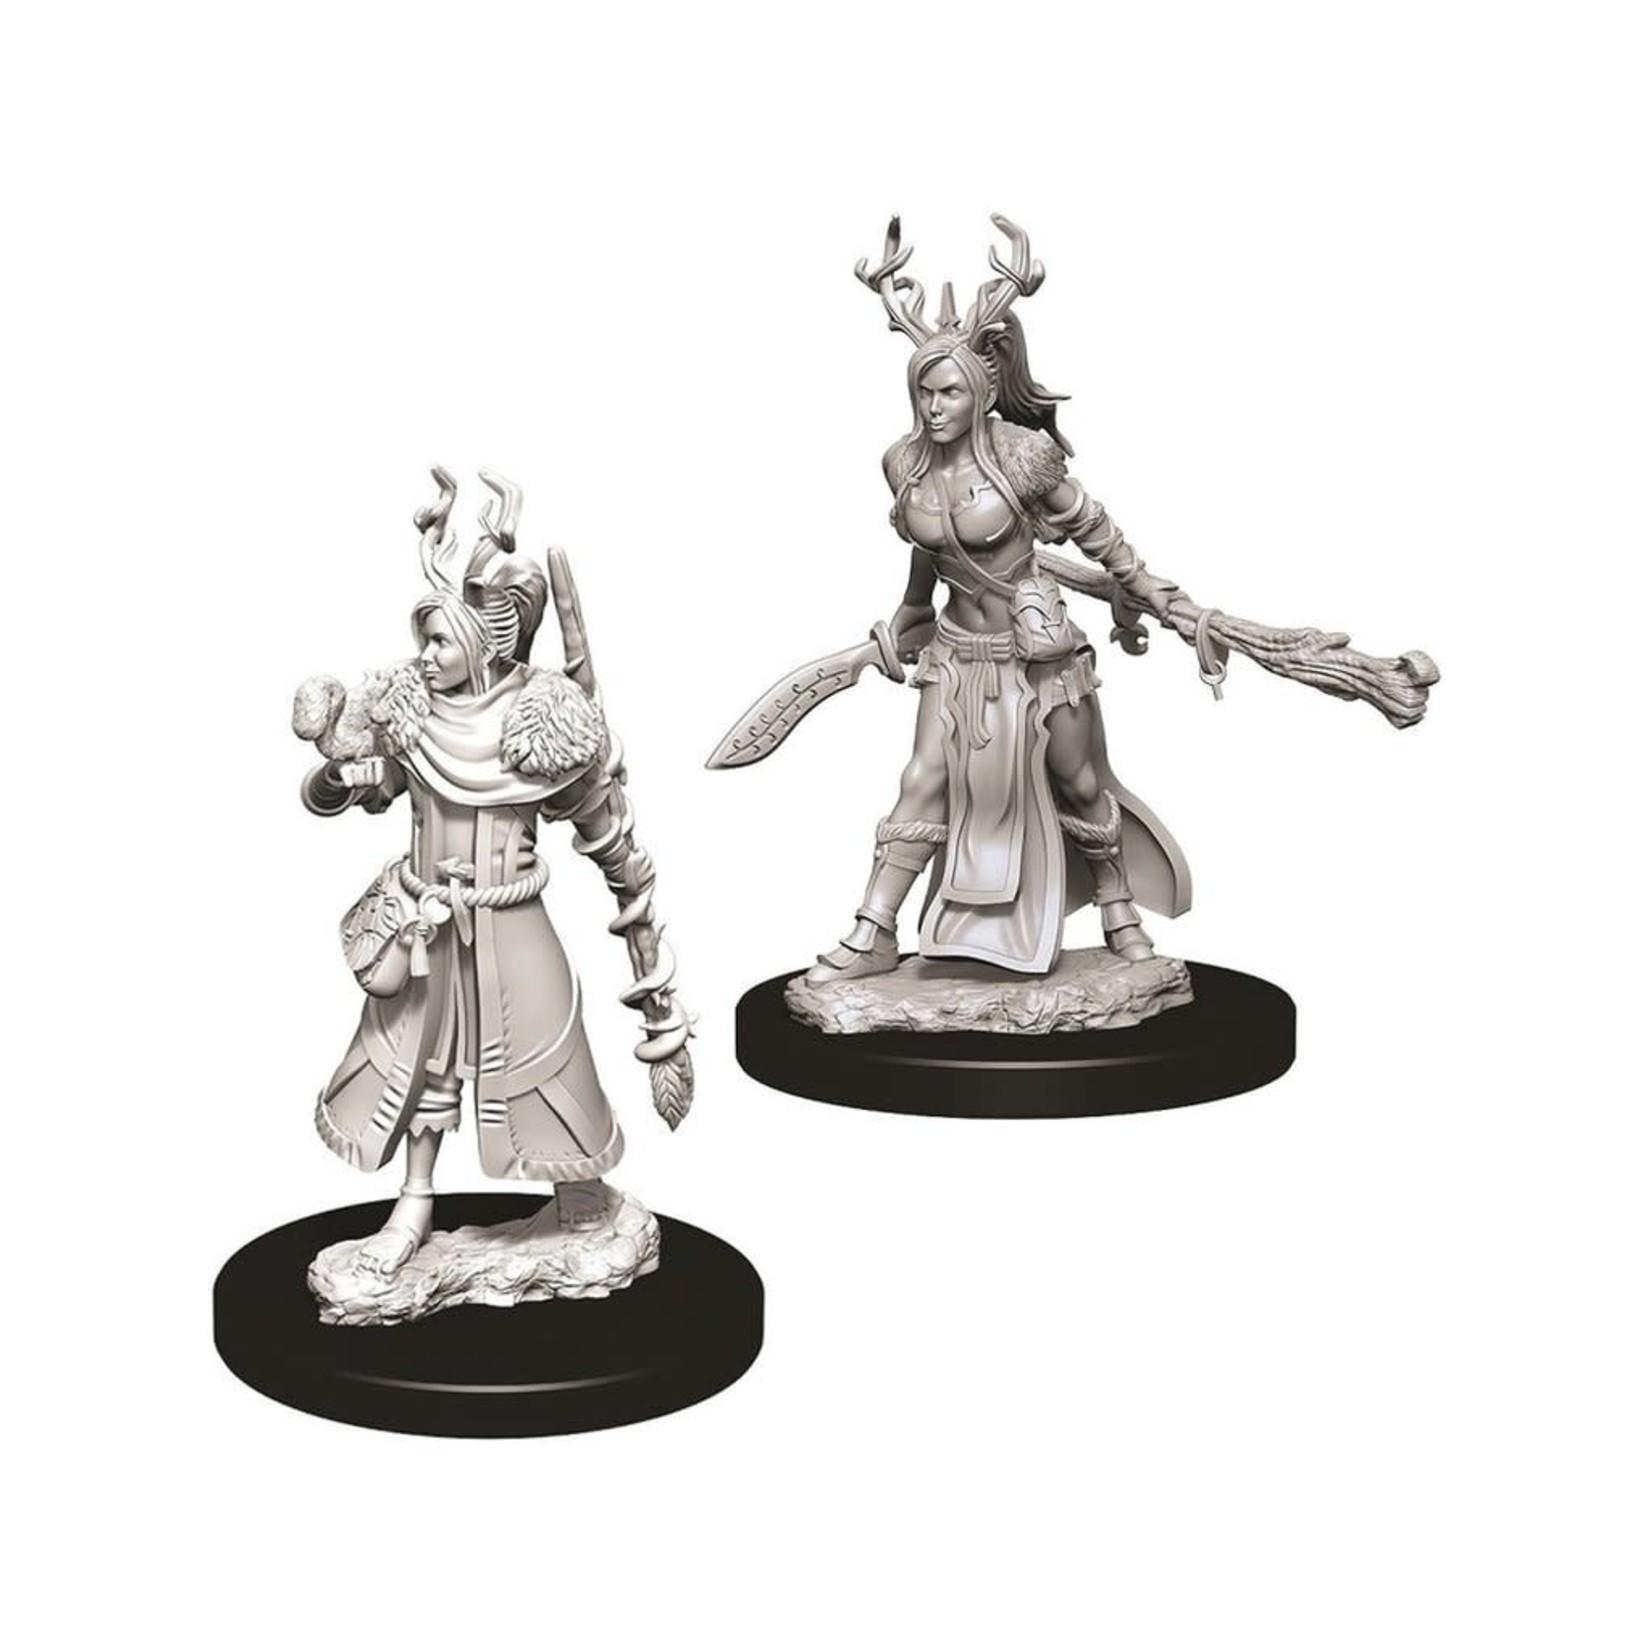 WizKids Dungeons & Dragons Nolzur's Marvelous Miniatures: Female Human Druid